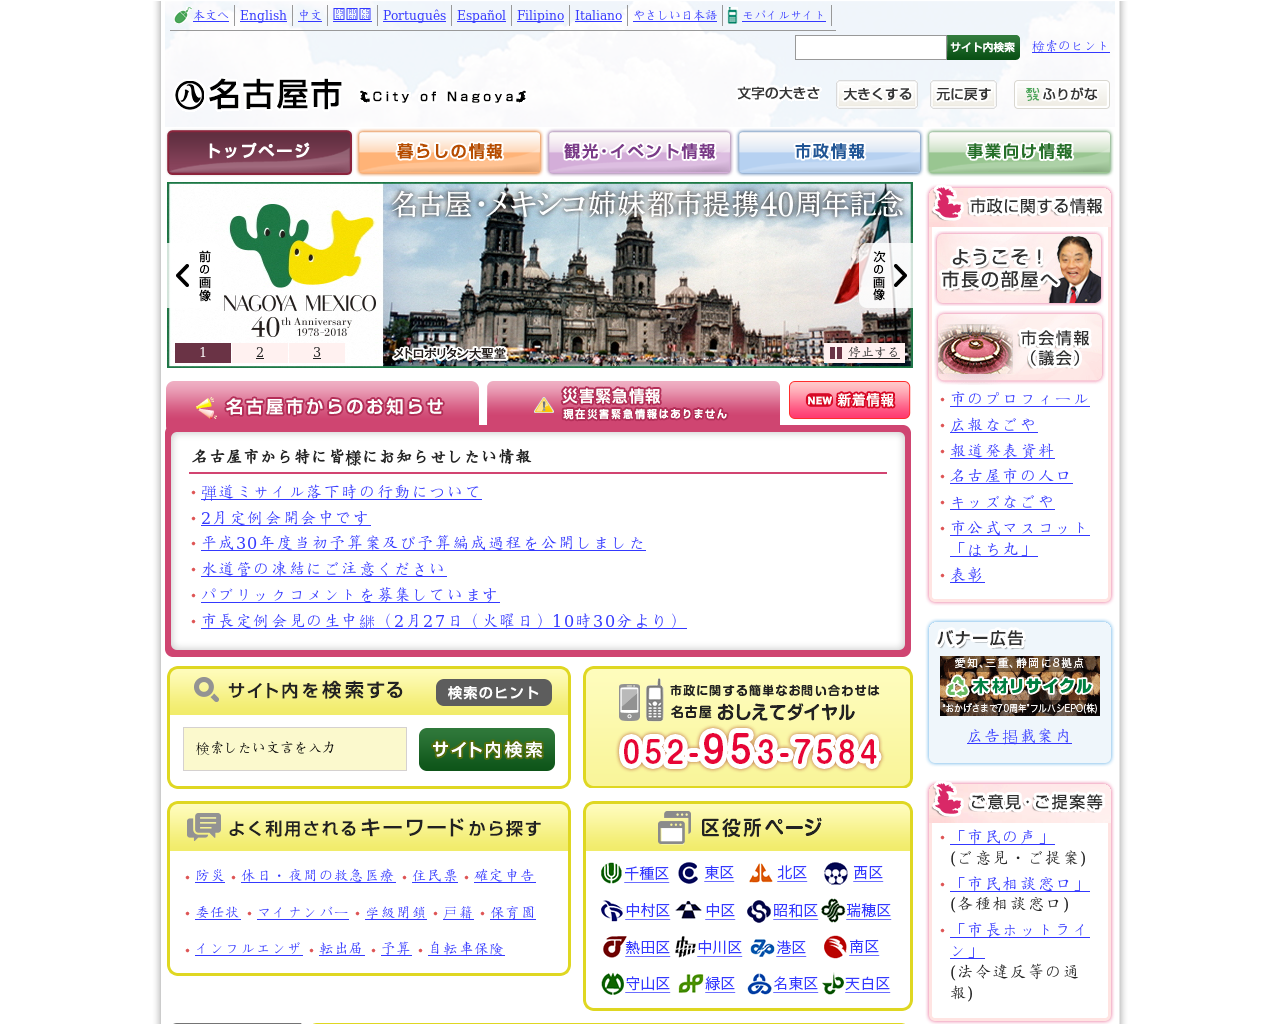 www.city.nagoya.jp(2018/02/27 01:20:40)